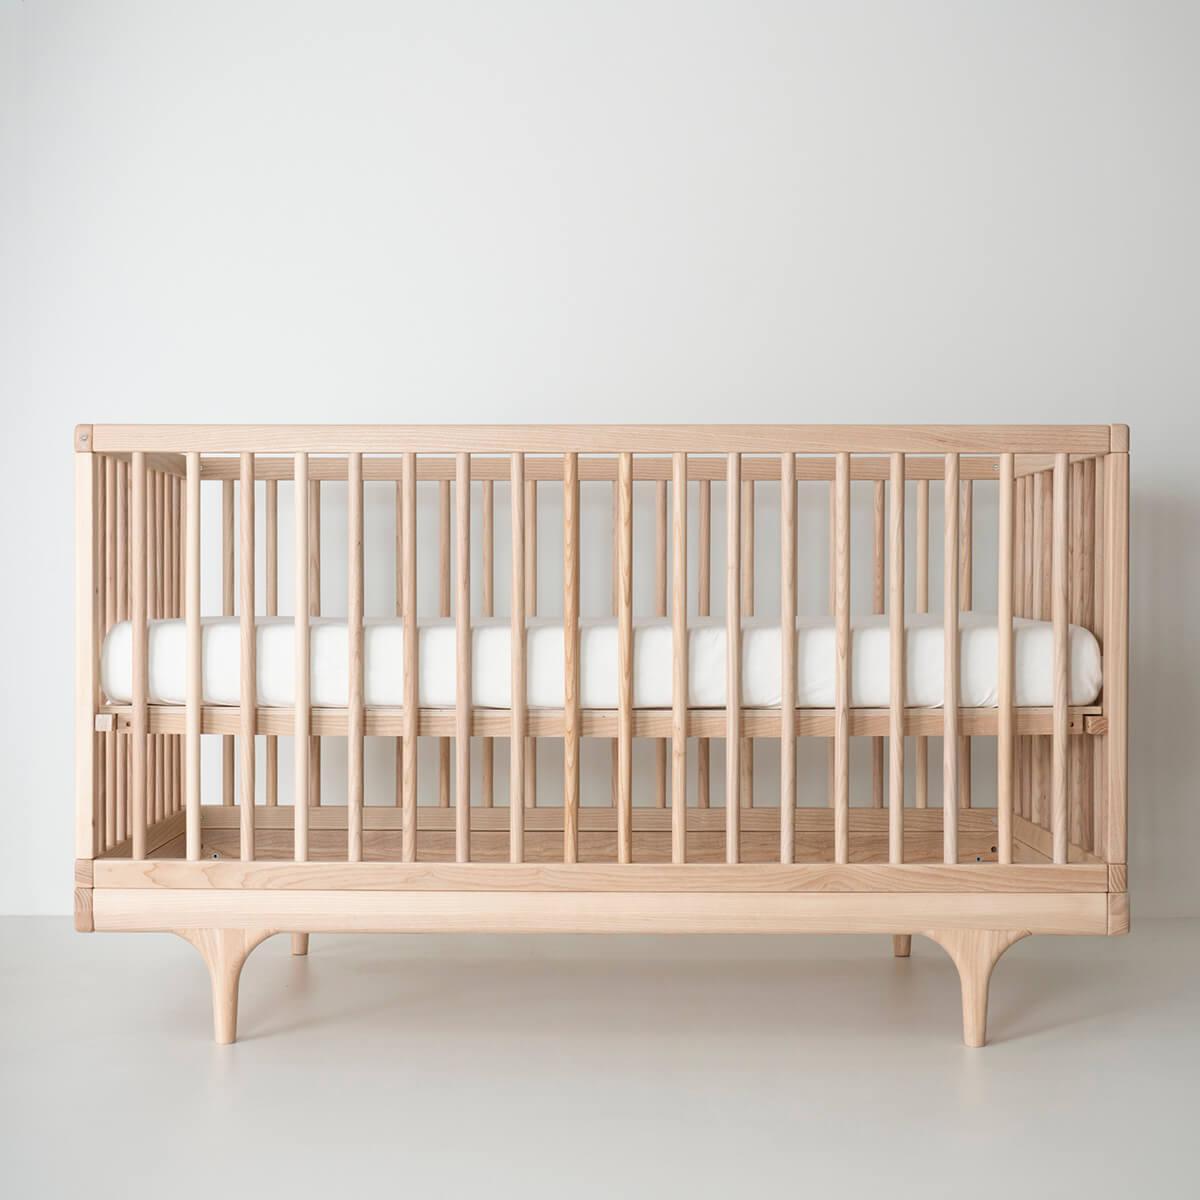 Lit bébé CARAVAN Kalon Studios frêne huilé blanchi